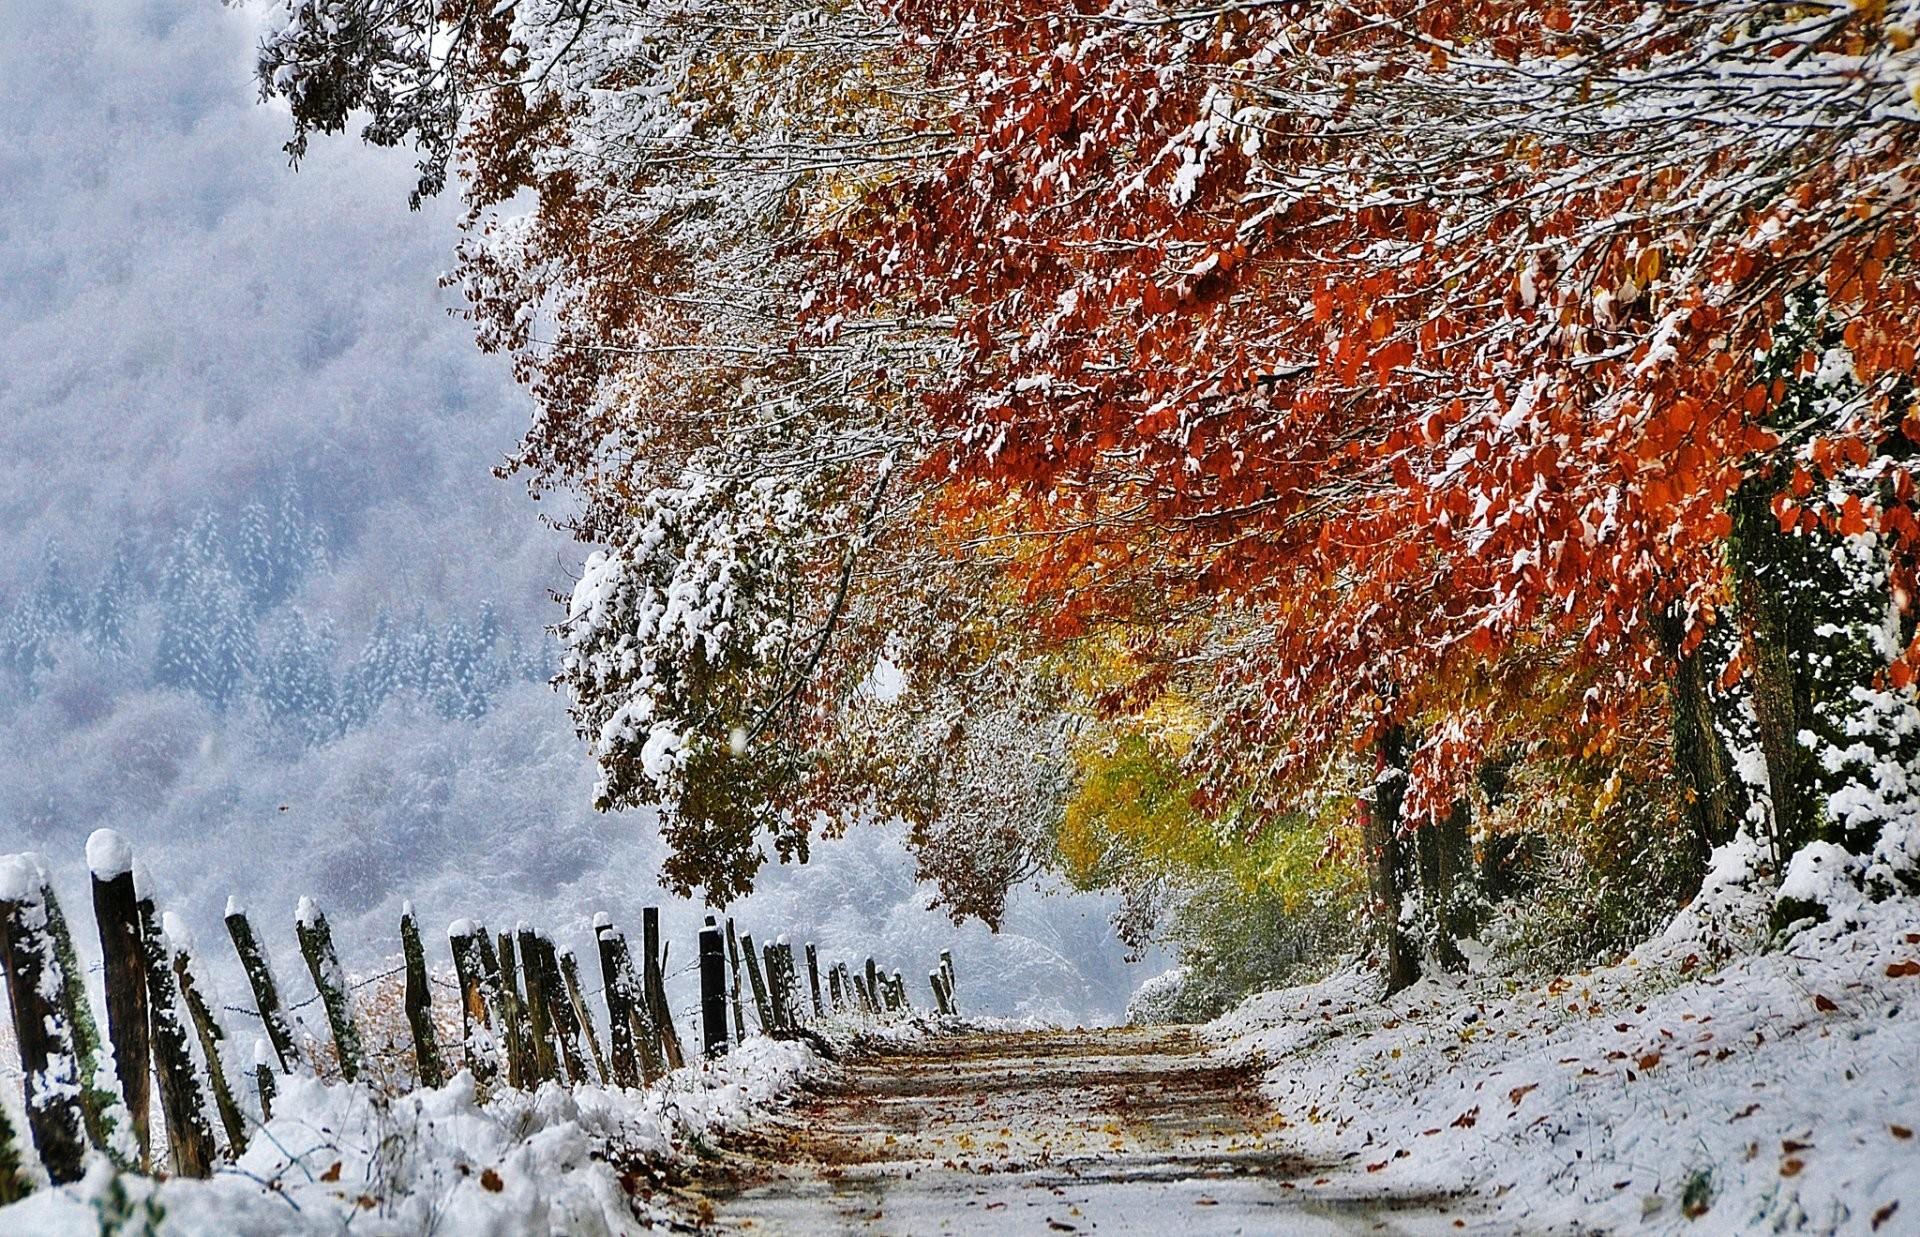 nature france autumn november snow